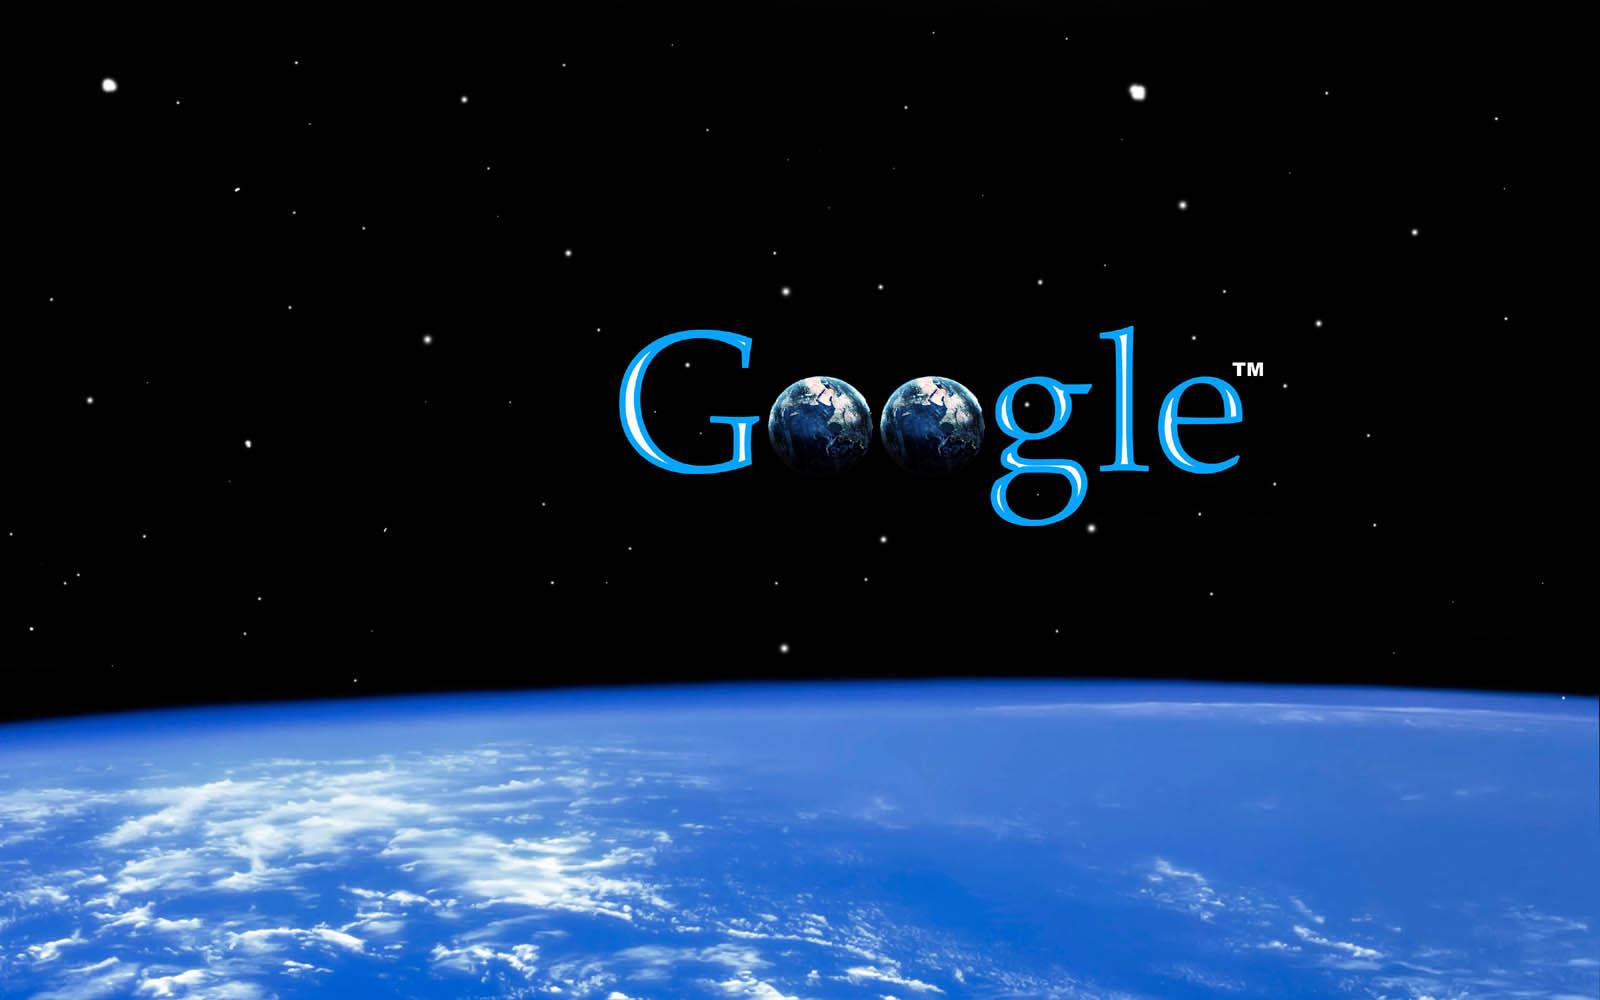 Google themes original - Google Backgrounds Hd Wallpapers